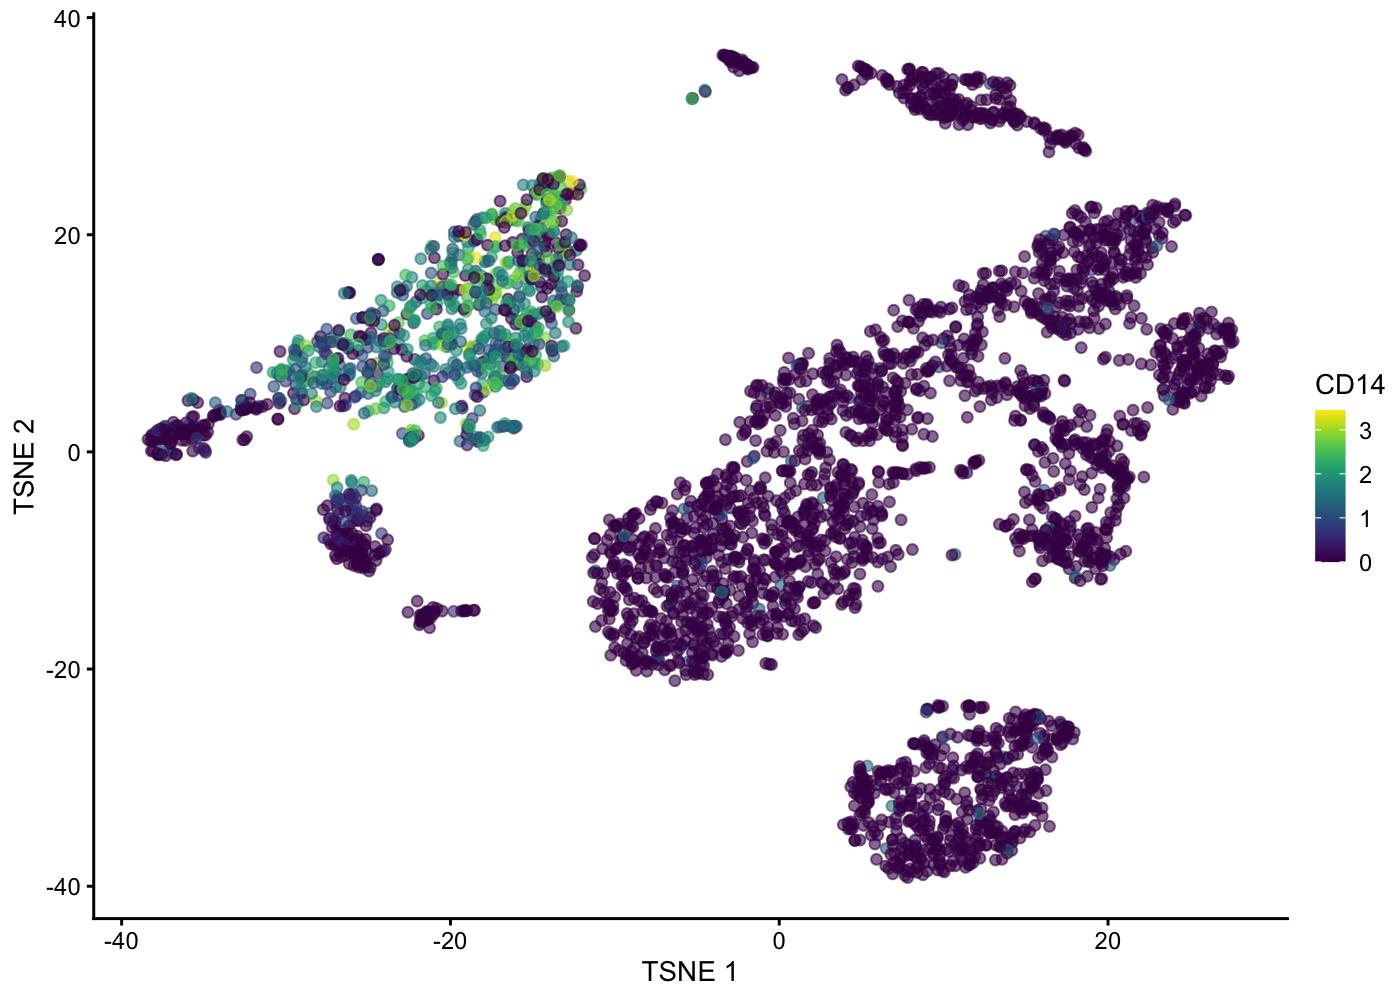 public/figure/sahmri_analysis-workflow.Rmd/tsne_plot-2.png